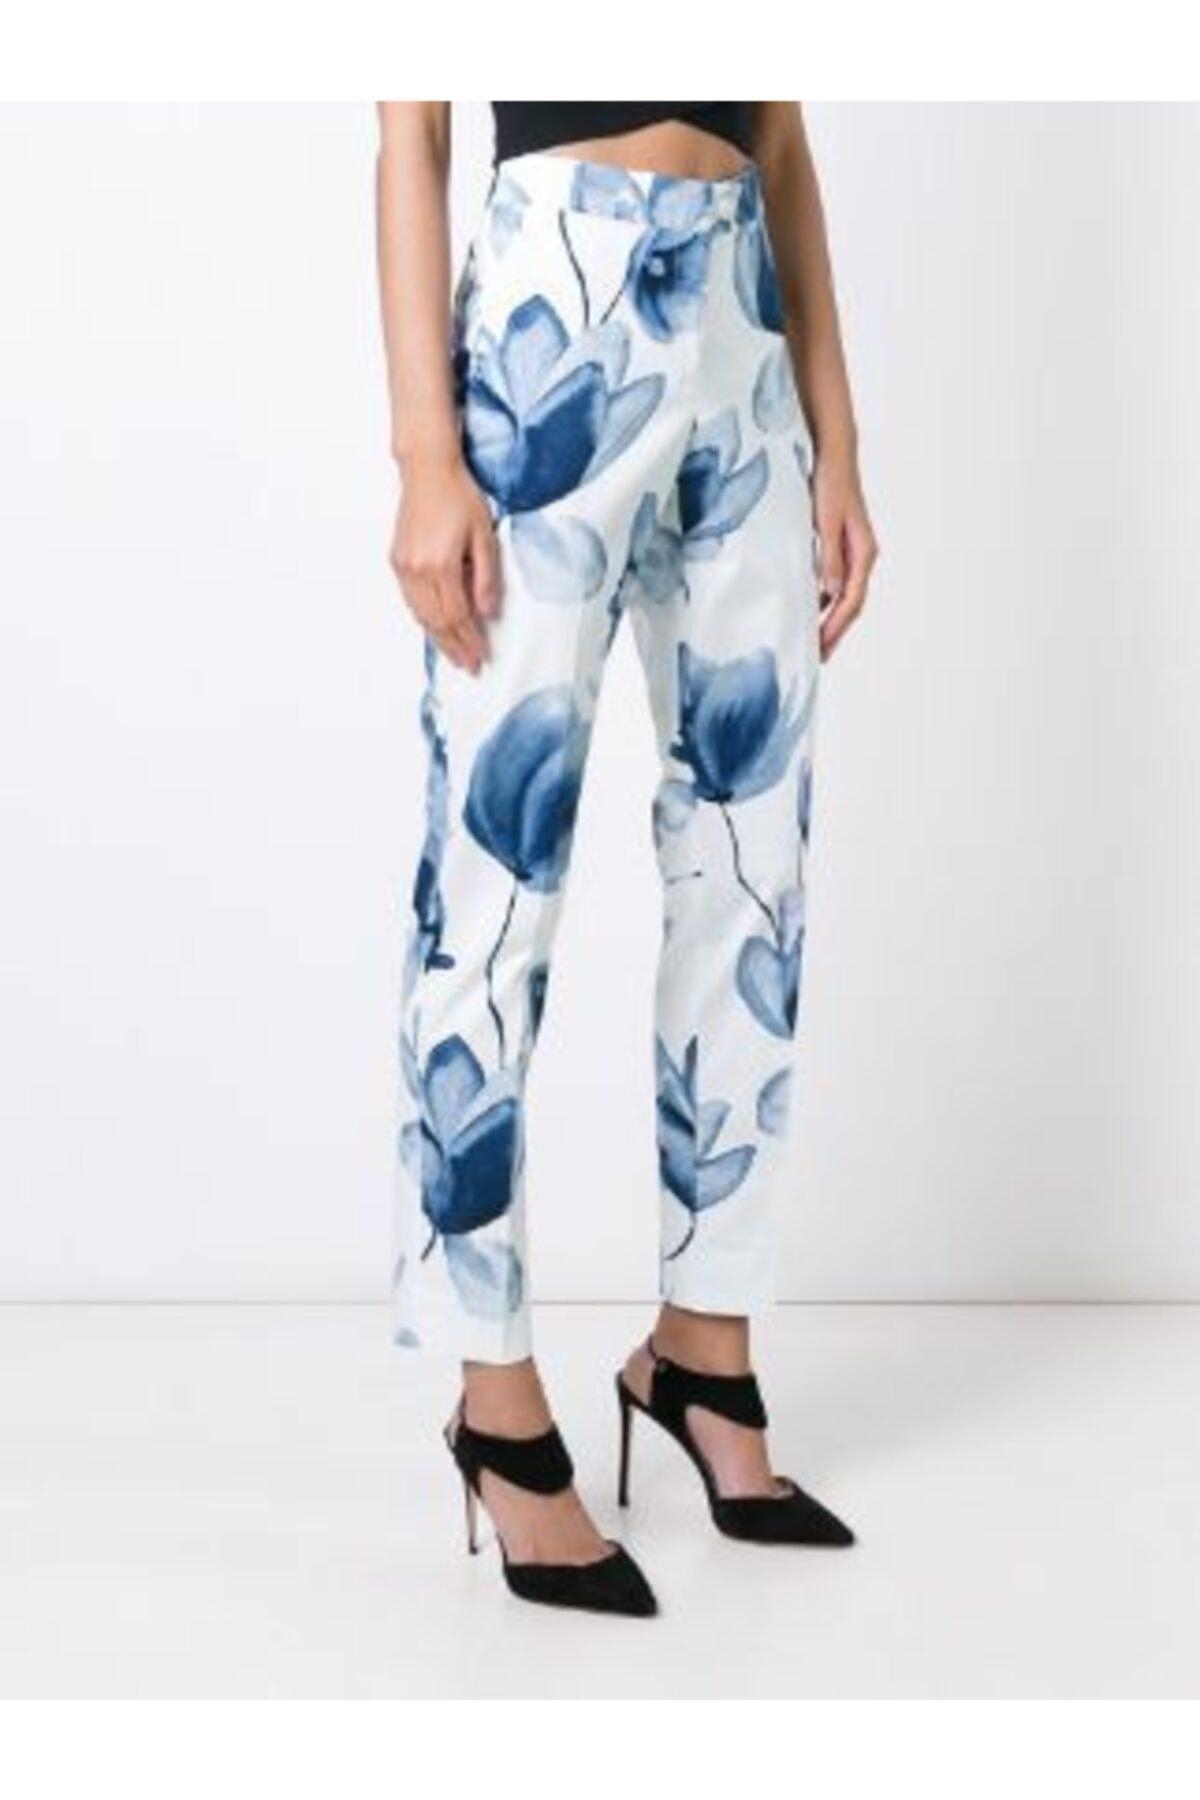 Armani Jeans Kadın Jeans Pantolon 1